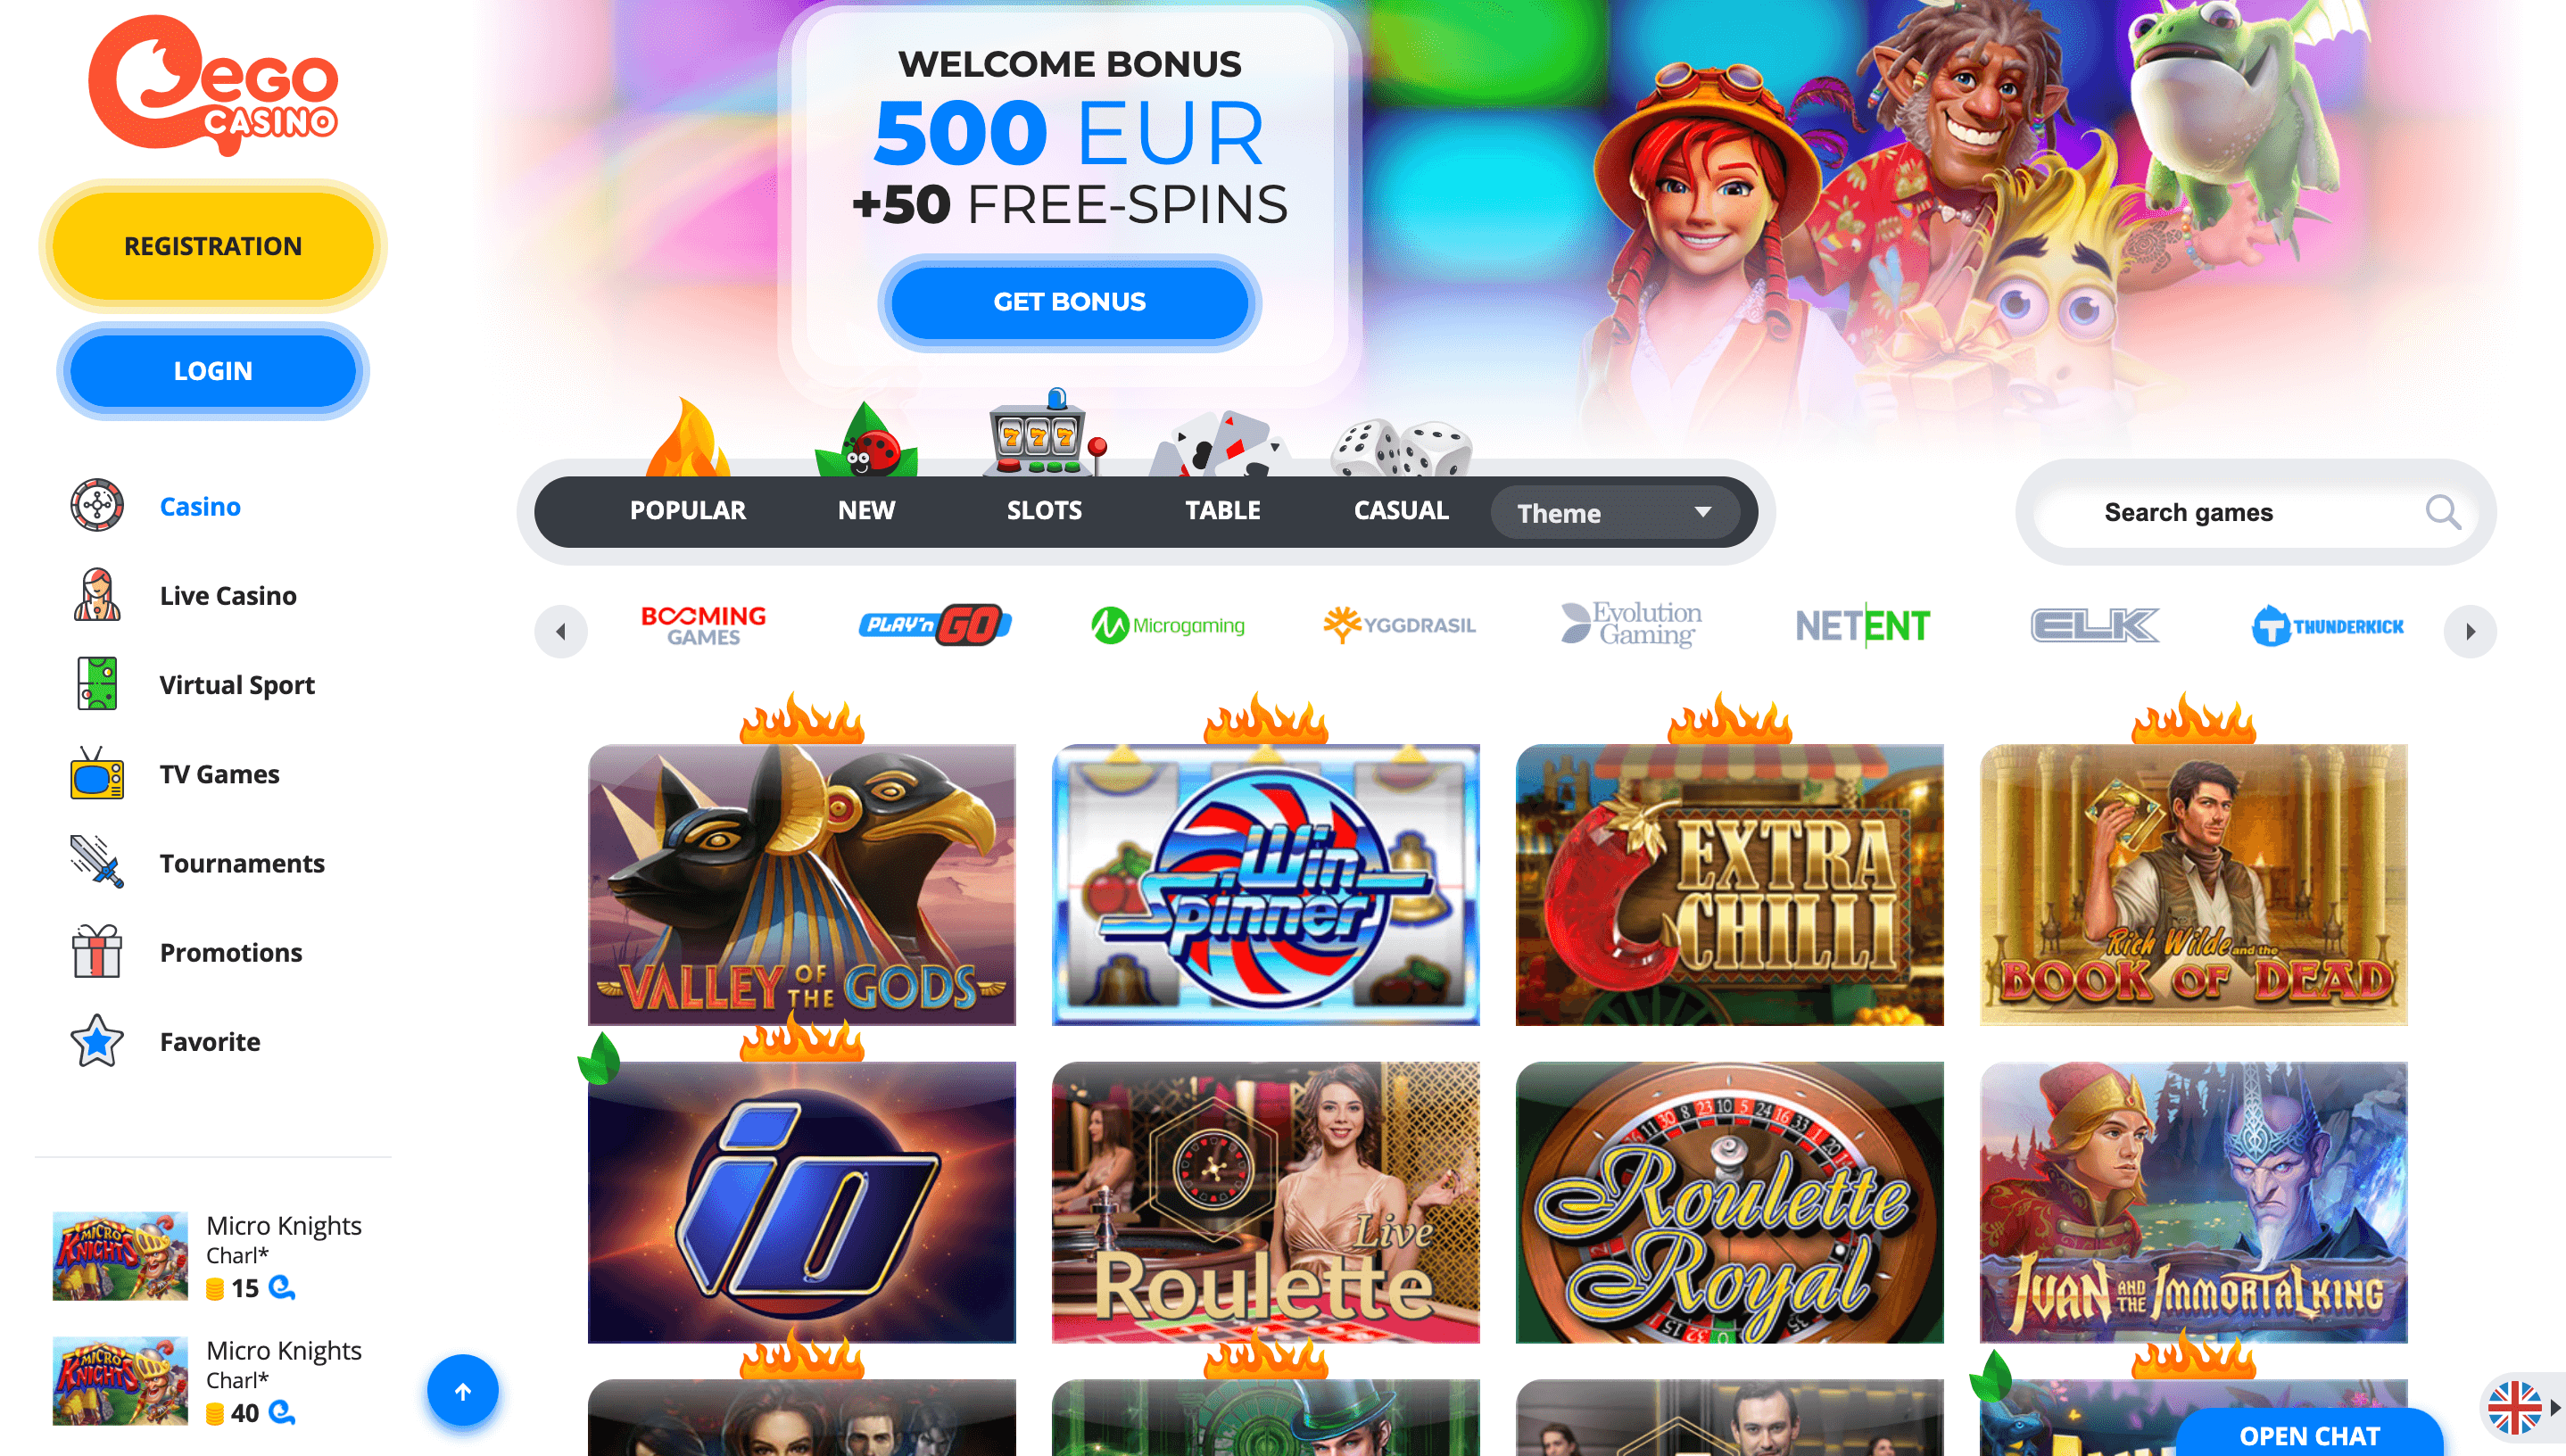 ego casino website page